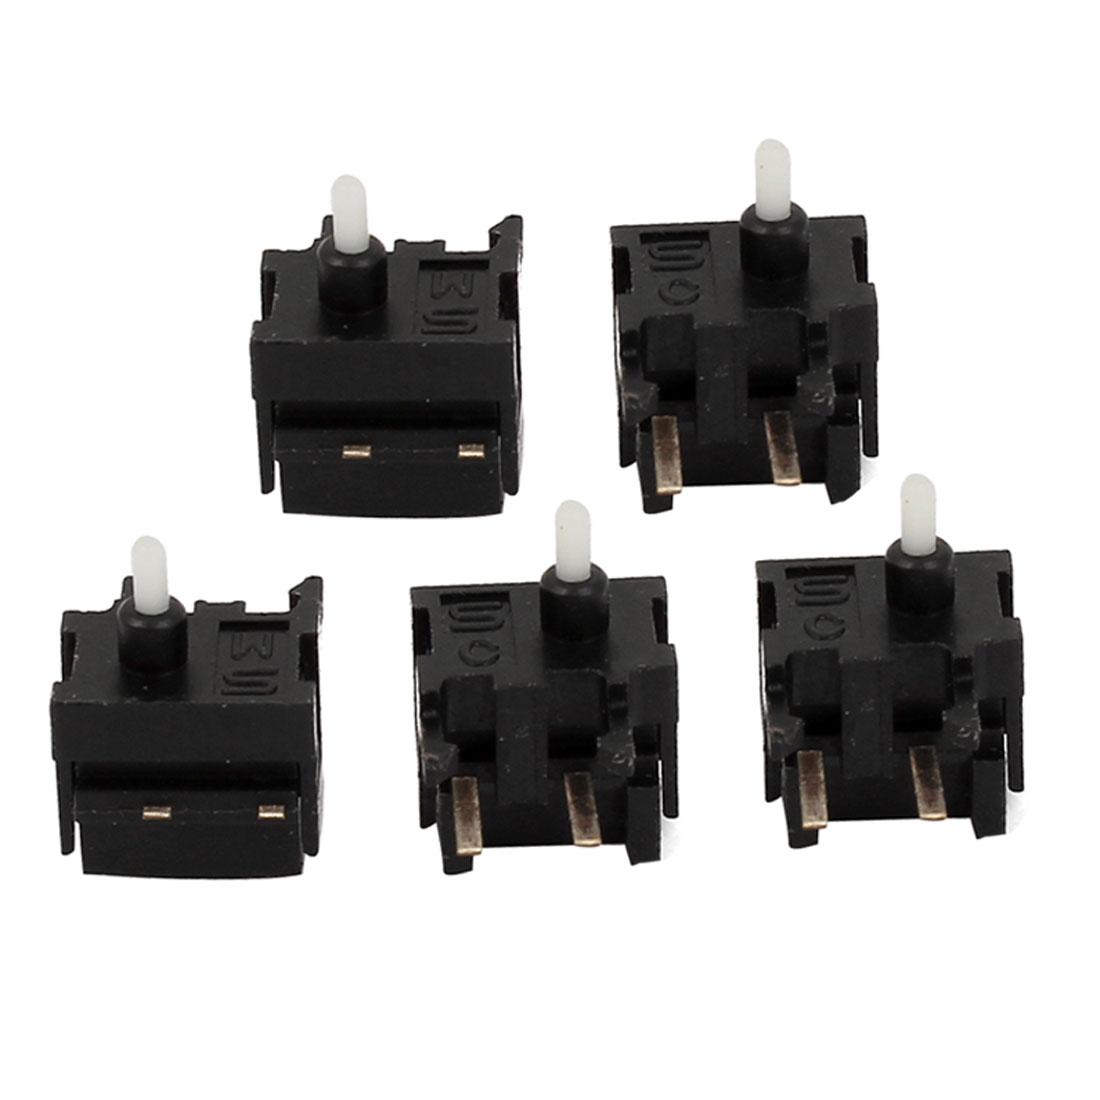 5 Pcs PCB Mount Tactile Push Button SPST Mini Micro Switch 7x6.5x5mm